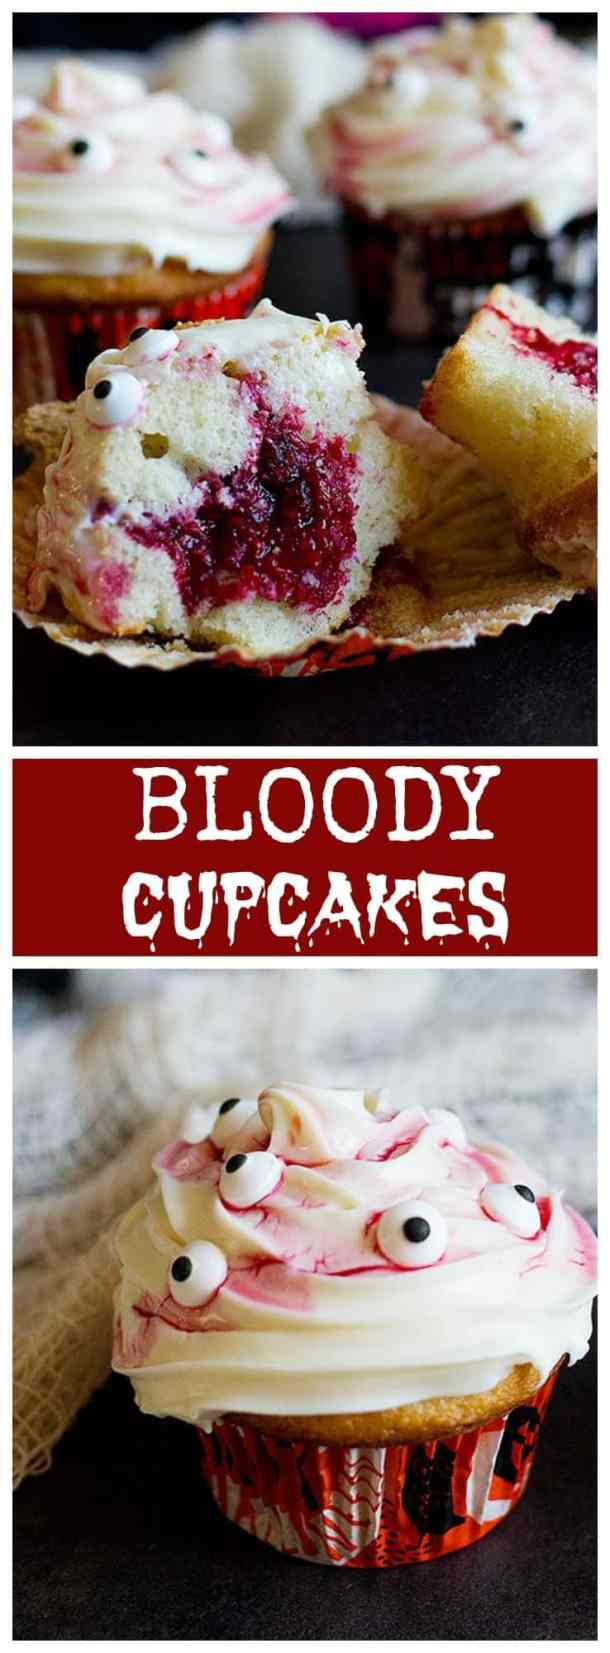 How to Make Bloody Cupcakes (Quick Tutorial) #Halloween #Cupcake From UnicornsintheKitchen.com